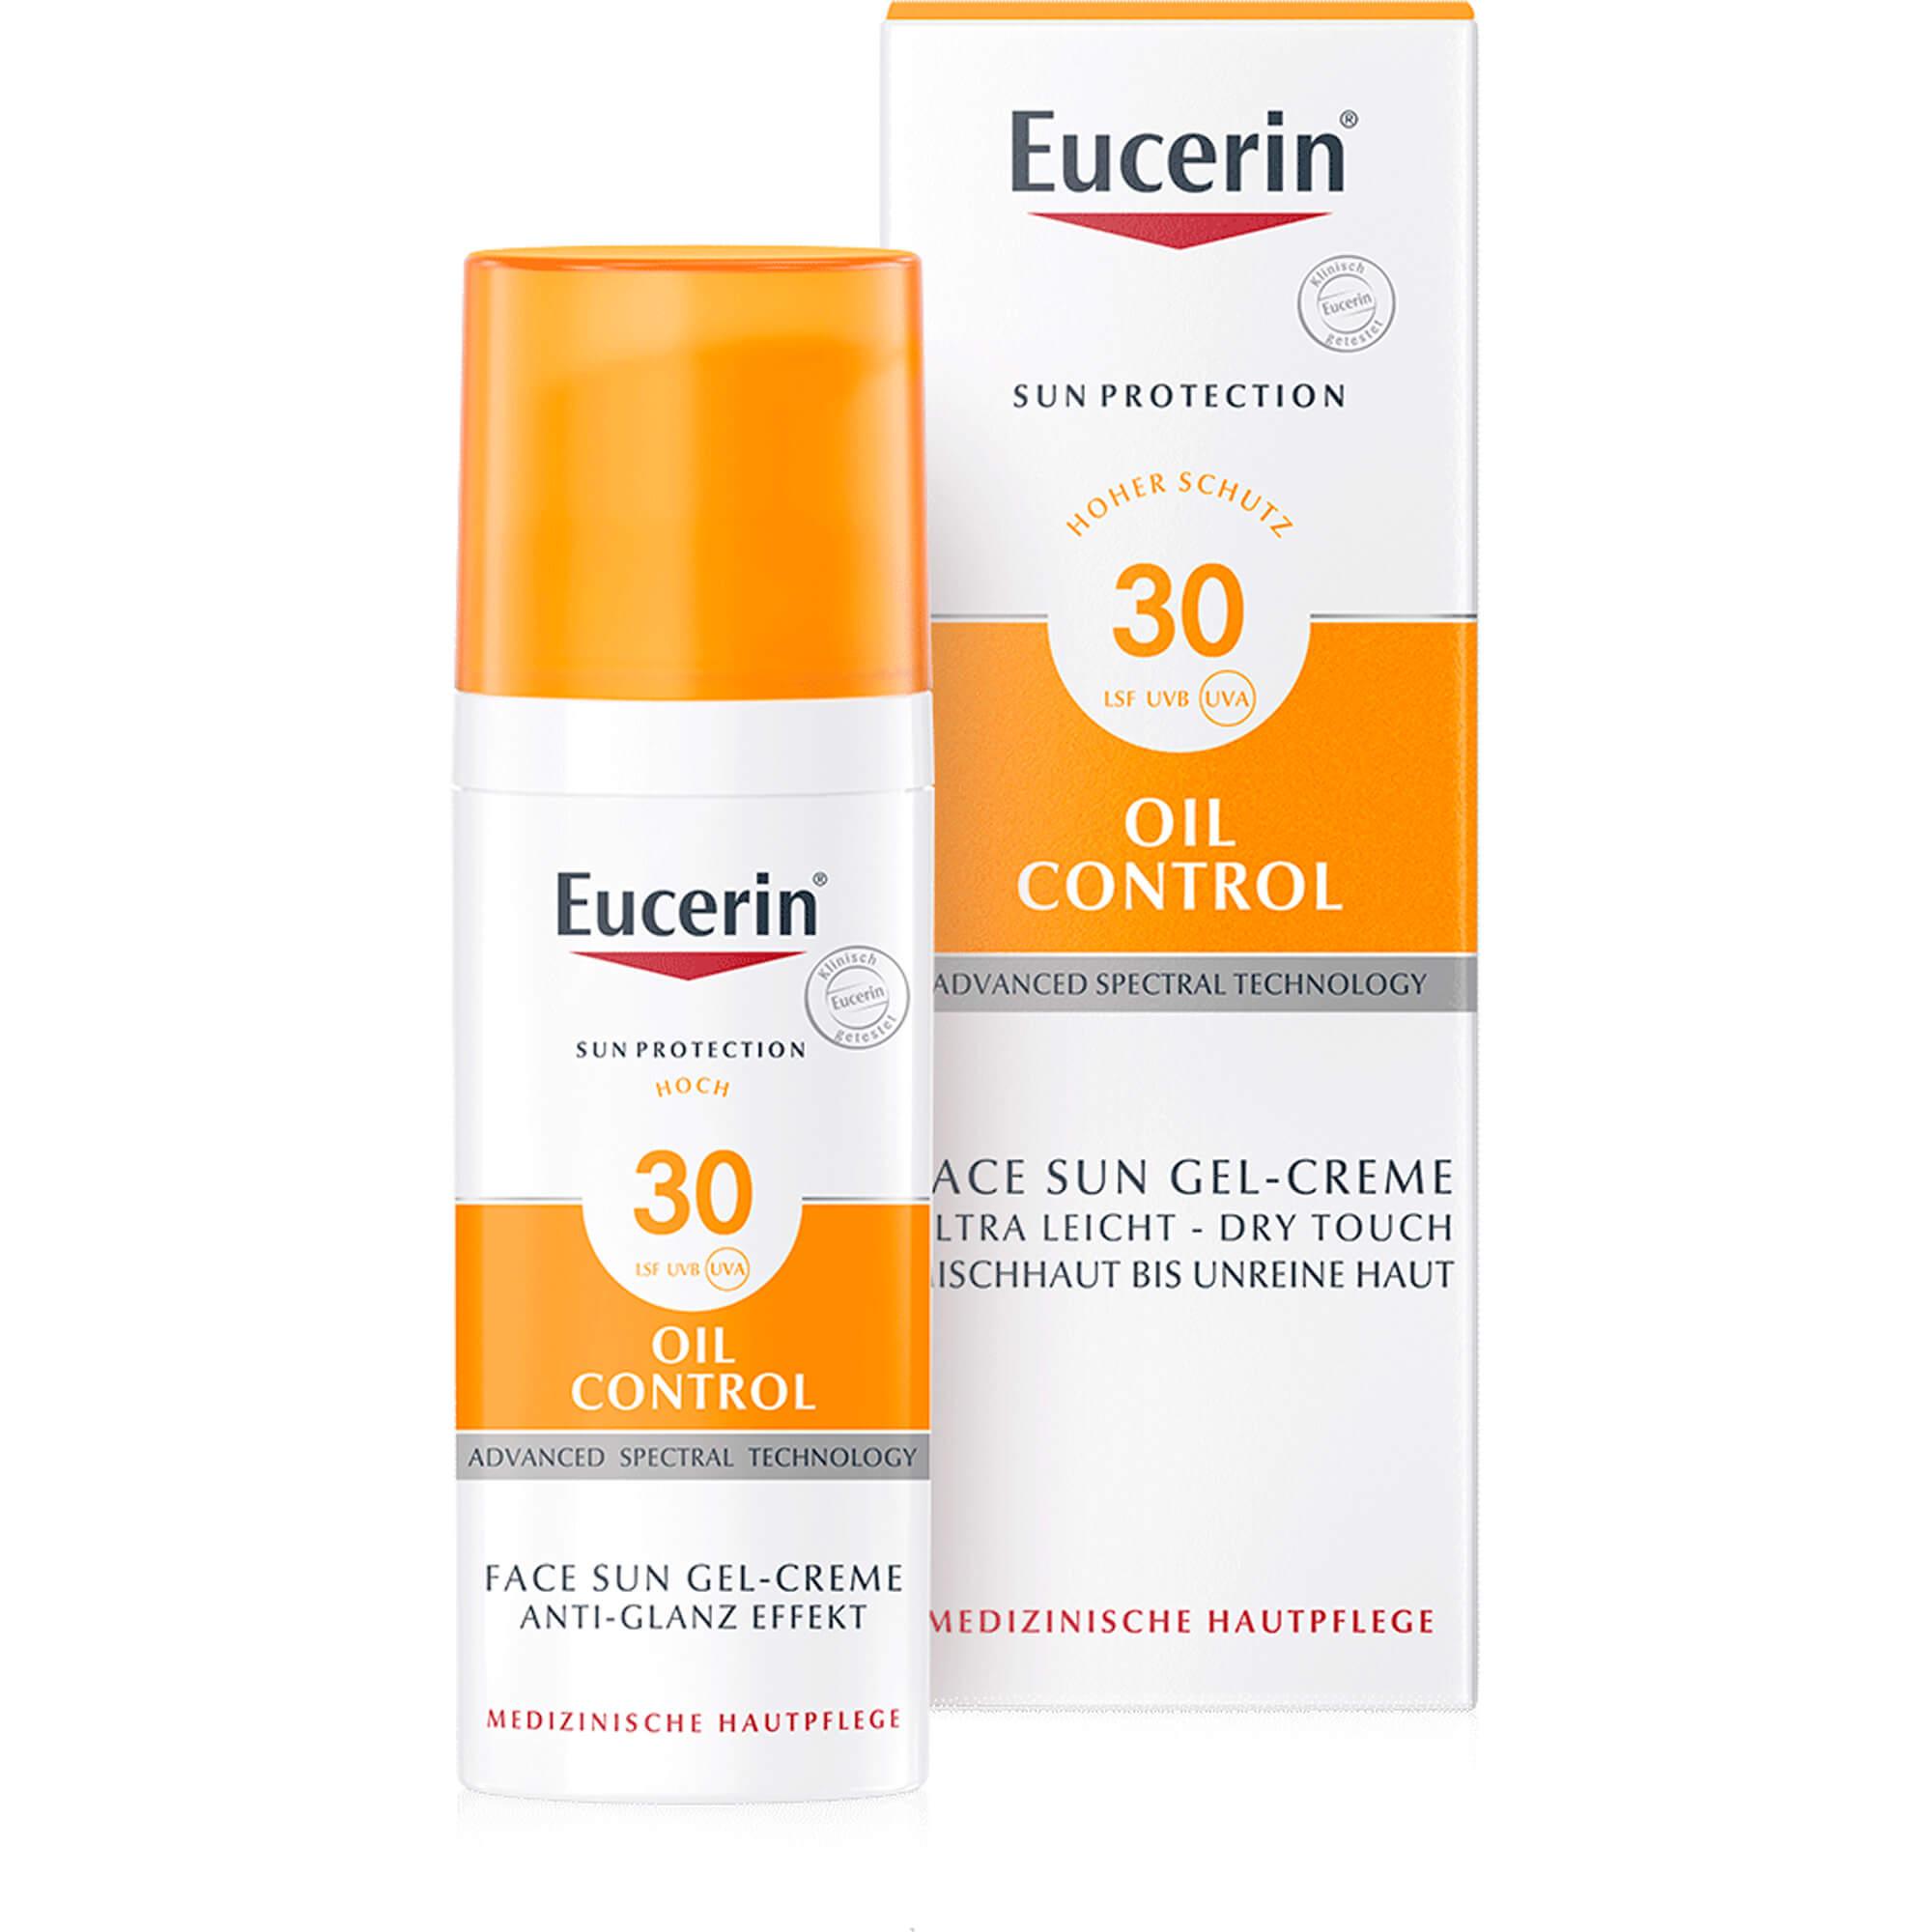 EUCERIN-Sun-Gel-Creme-Oil-Contr-Anti-Gl-Eff-LSF-30